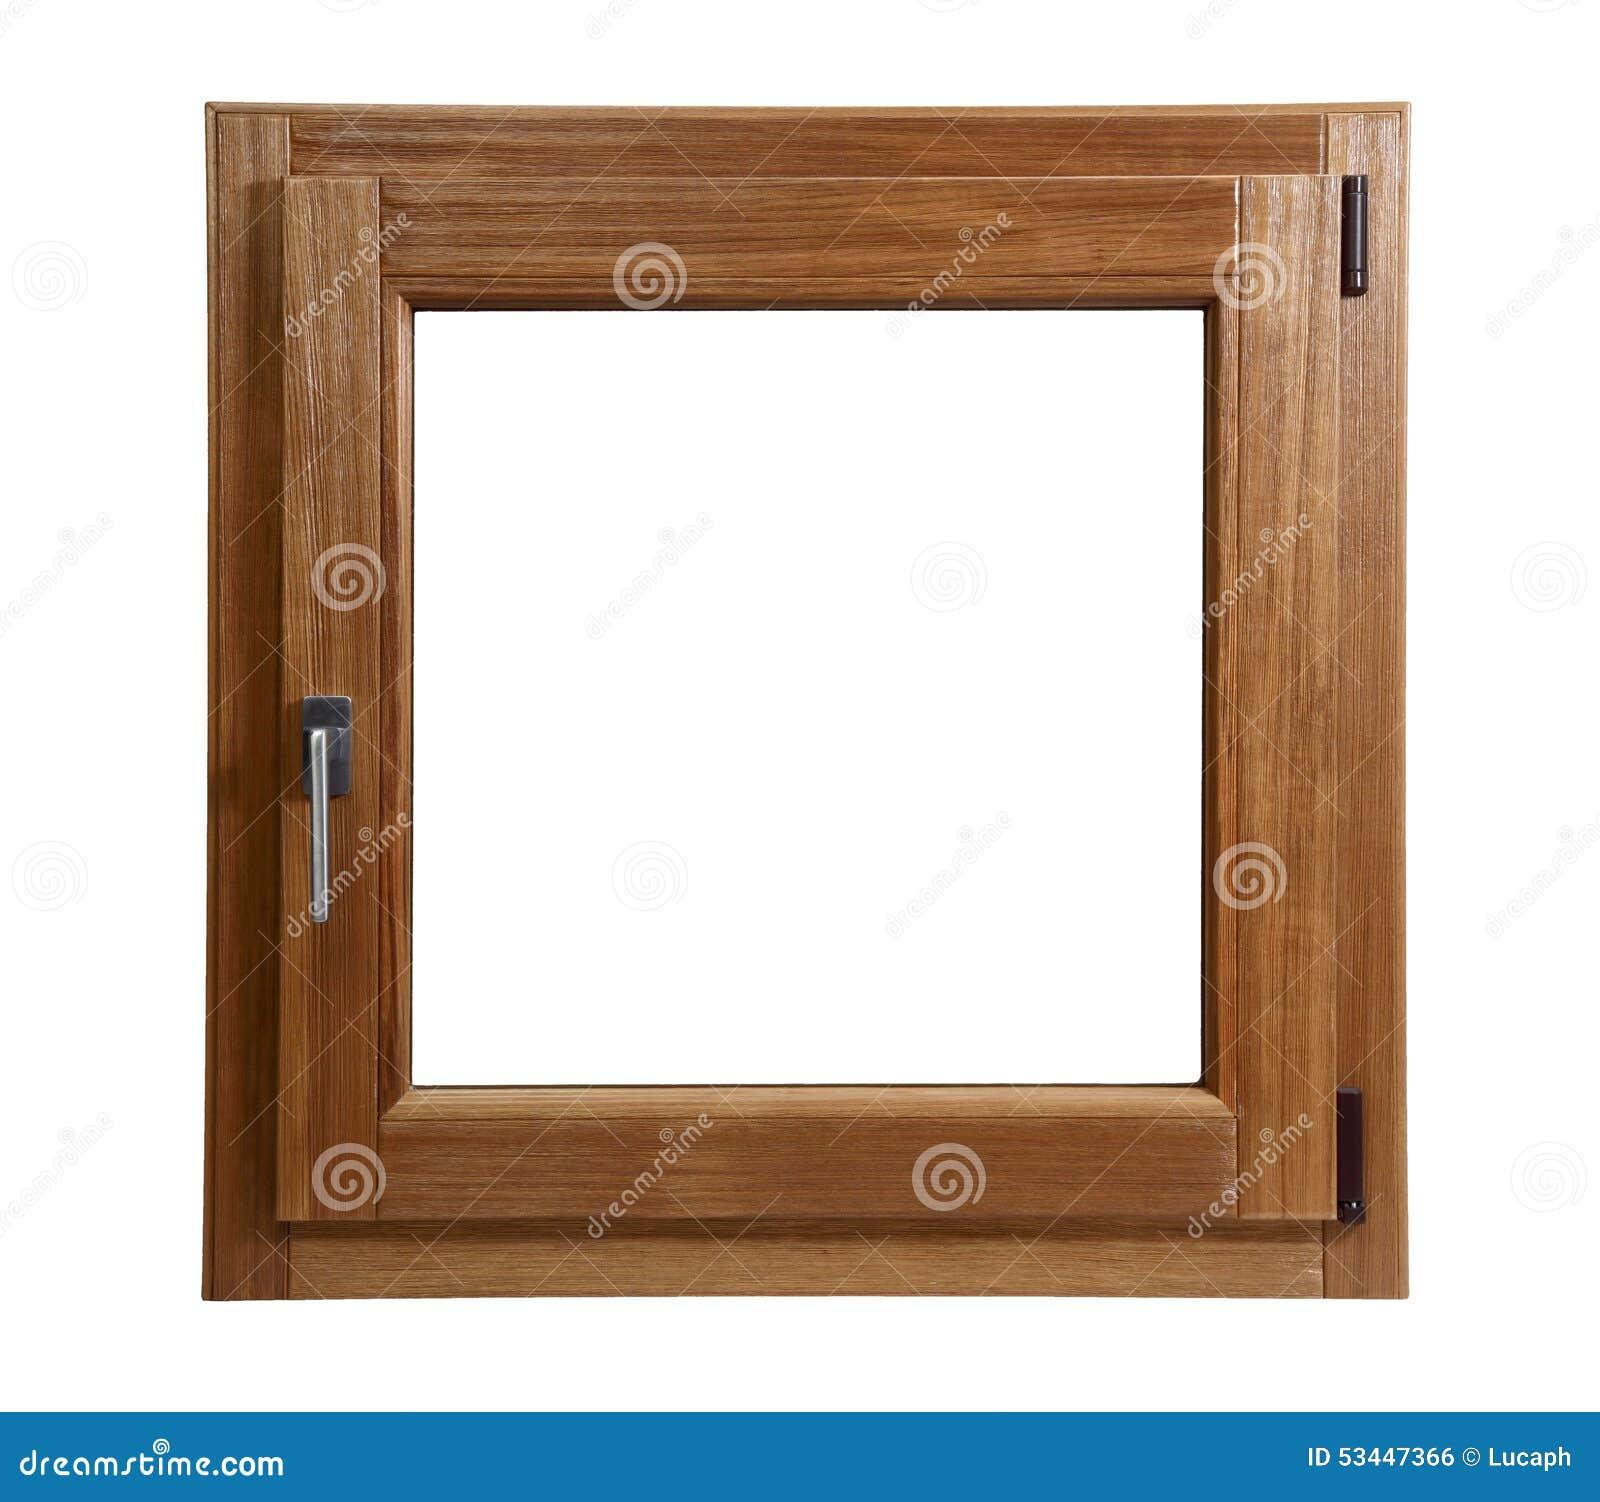 Fenster geschlossen clipart  Hölzernes Fenster Geschlossen Stockfoto - Bild: 53447366